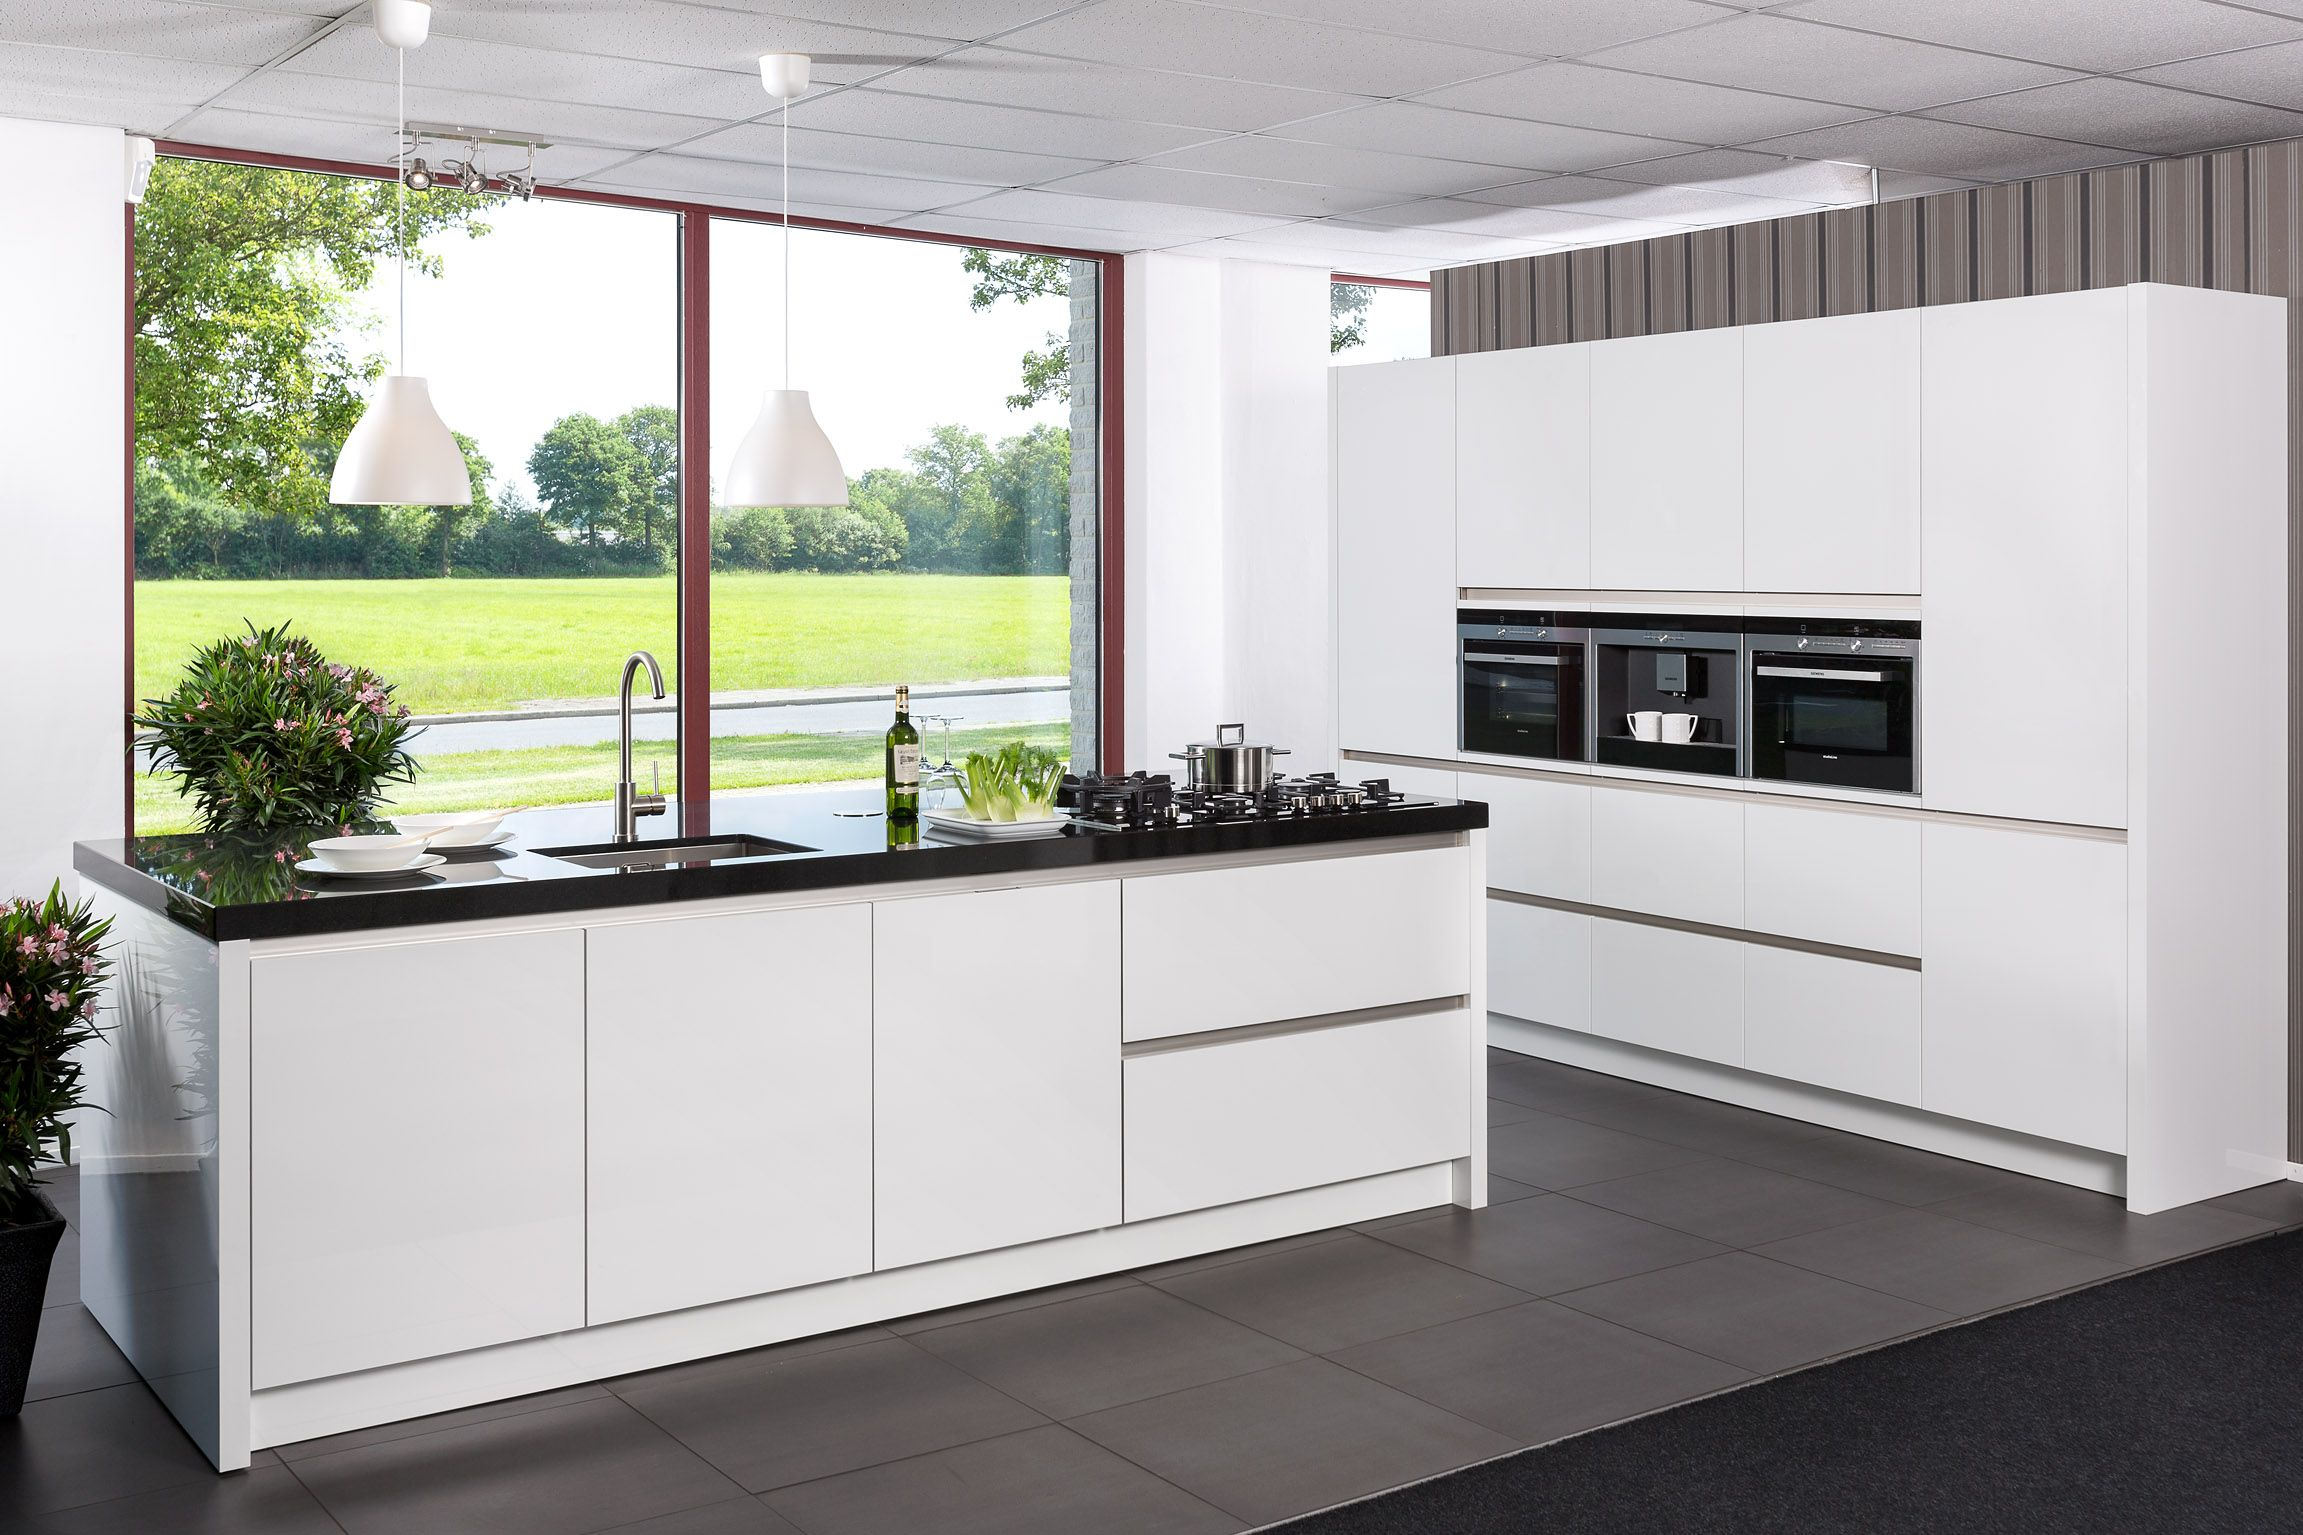 Greeploze Design Keukens : Keukens greeploze siemens eiland keuken